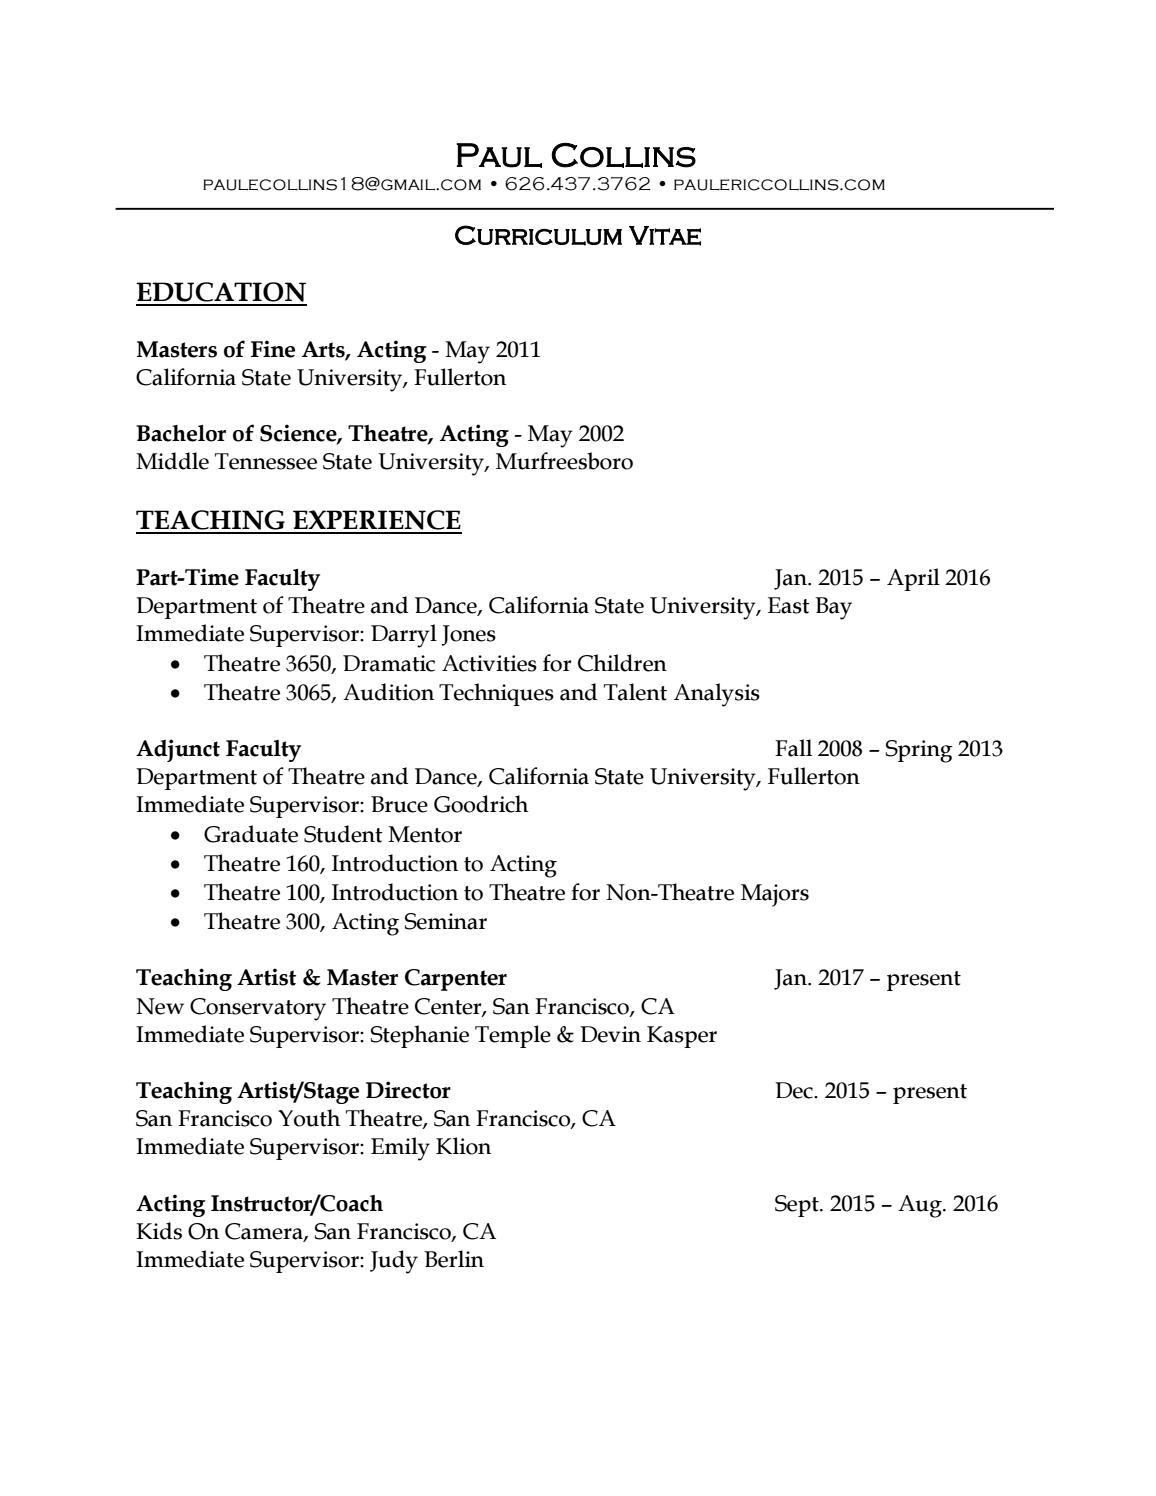 Paul Collins Curriculum Vitae By Paulecollins18 Issuu